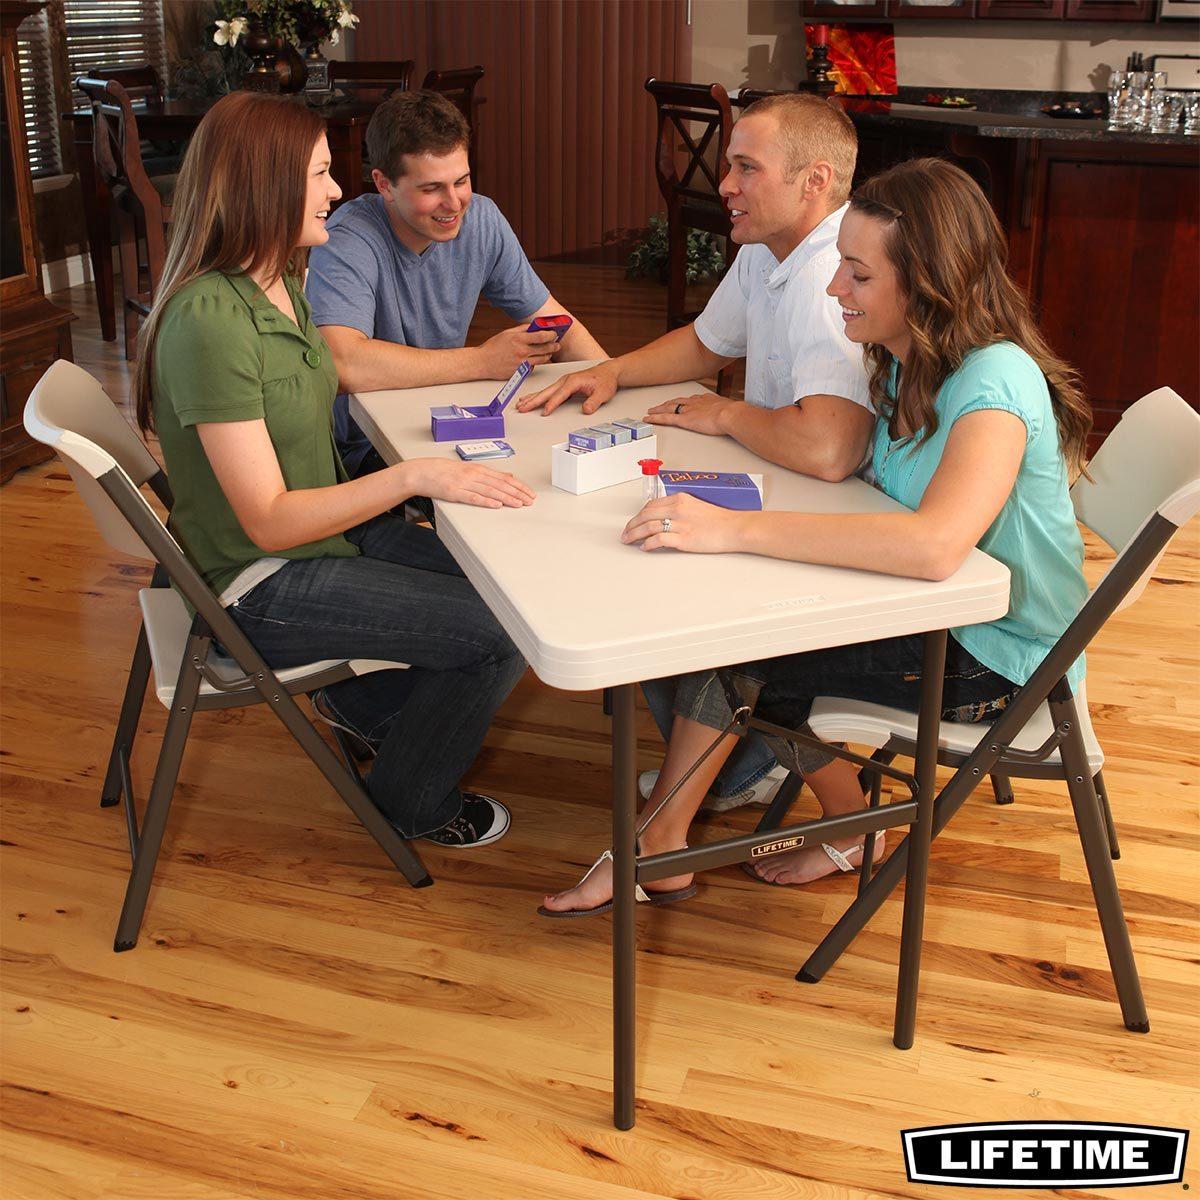 lifetime 4ft commercial grade folding table costco uk